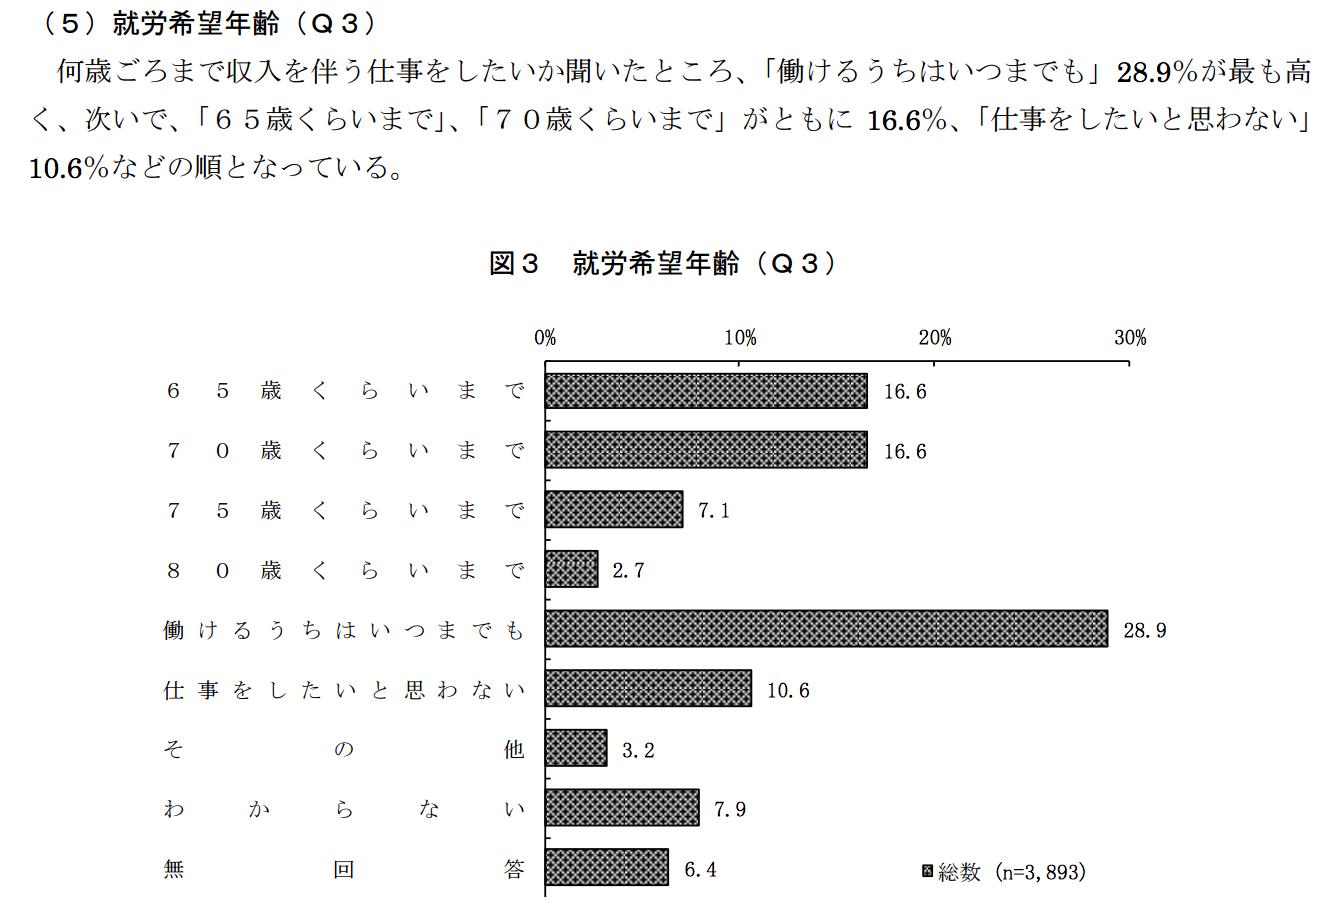 %e3%82%b9%e3%82%af%e3%83%aa%e3%83%bc%e3%83%b3%e3%82%b7%e3%83%a7%e3%83%83%e3%83%88-2016-12-31-00-25-06